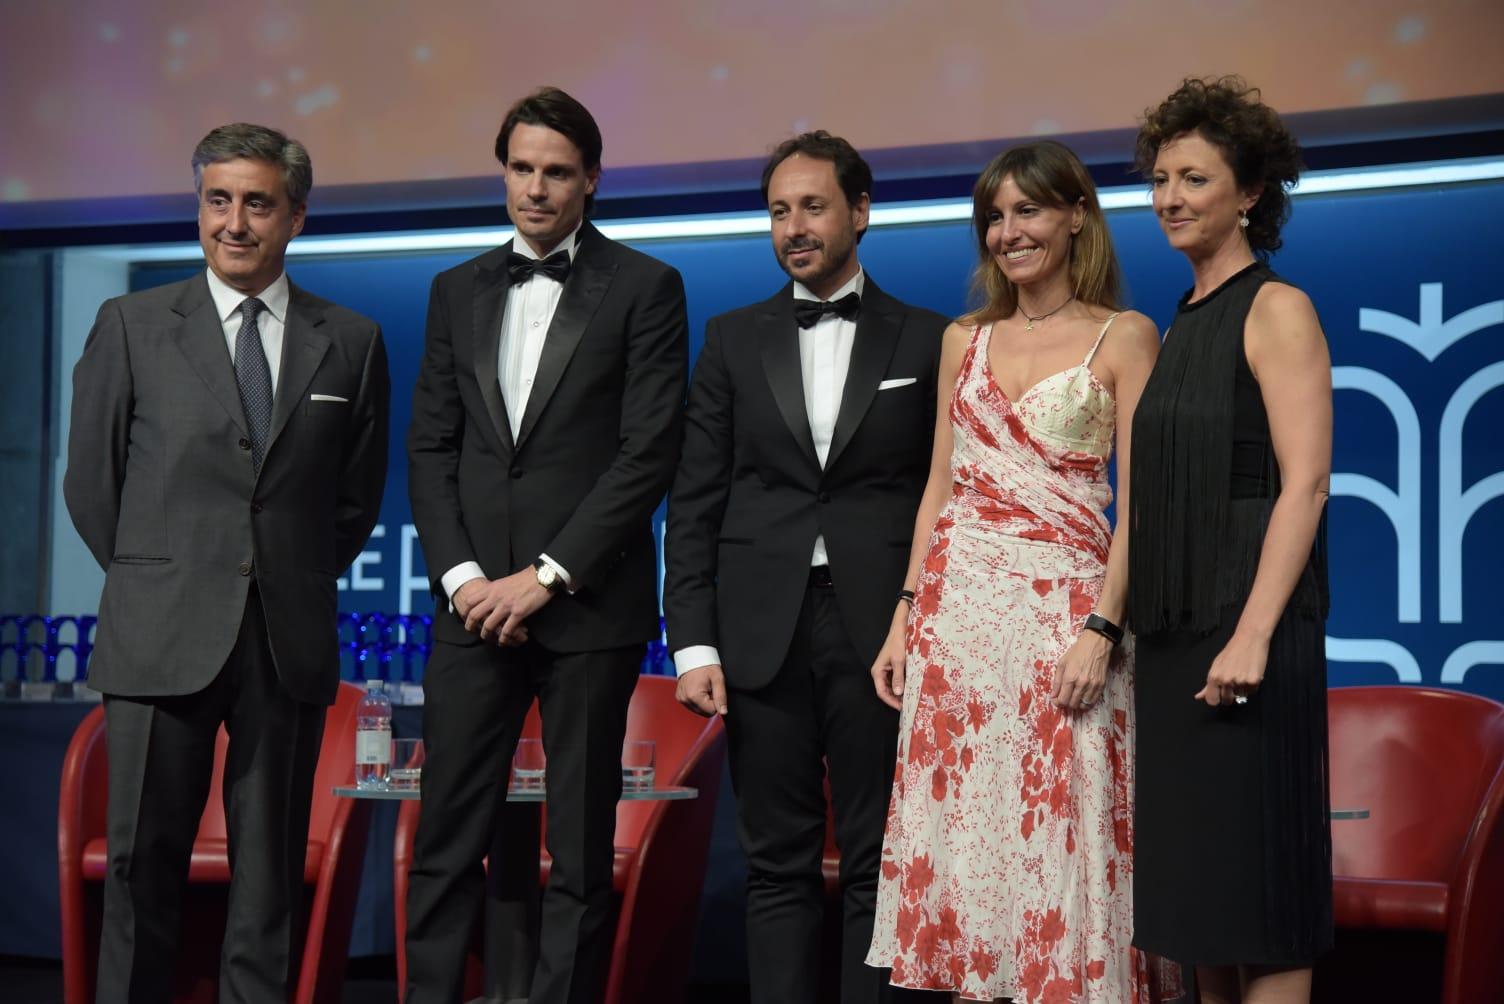 Jansenn-Cilag, Pfizer, Takeda e Orsingher Ortu tra i premiati della serata